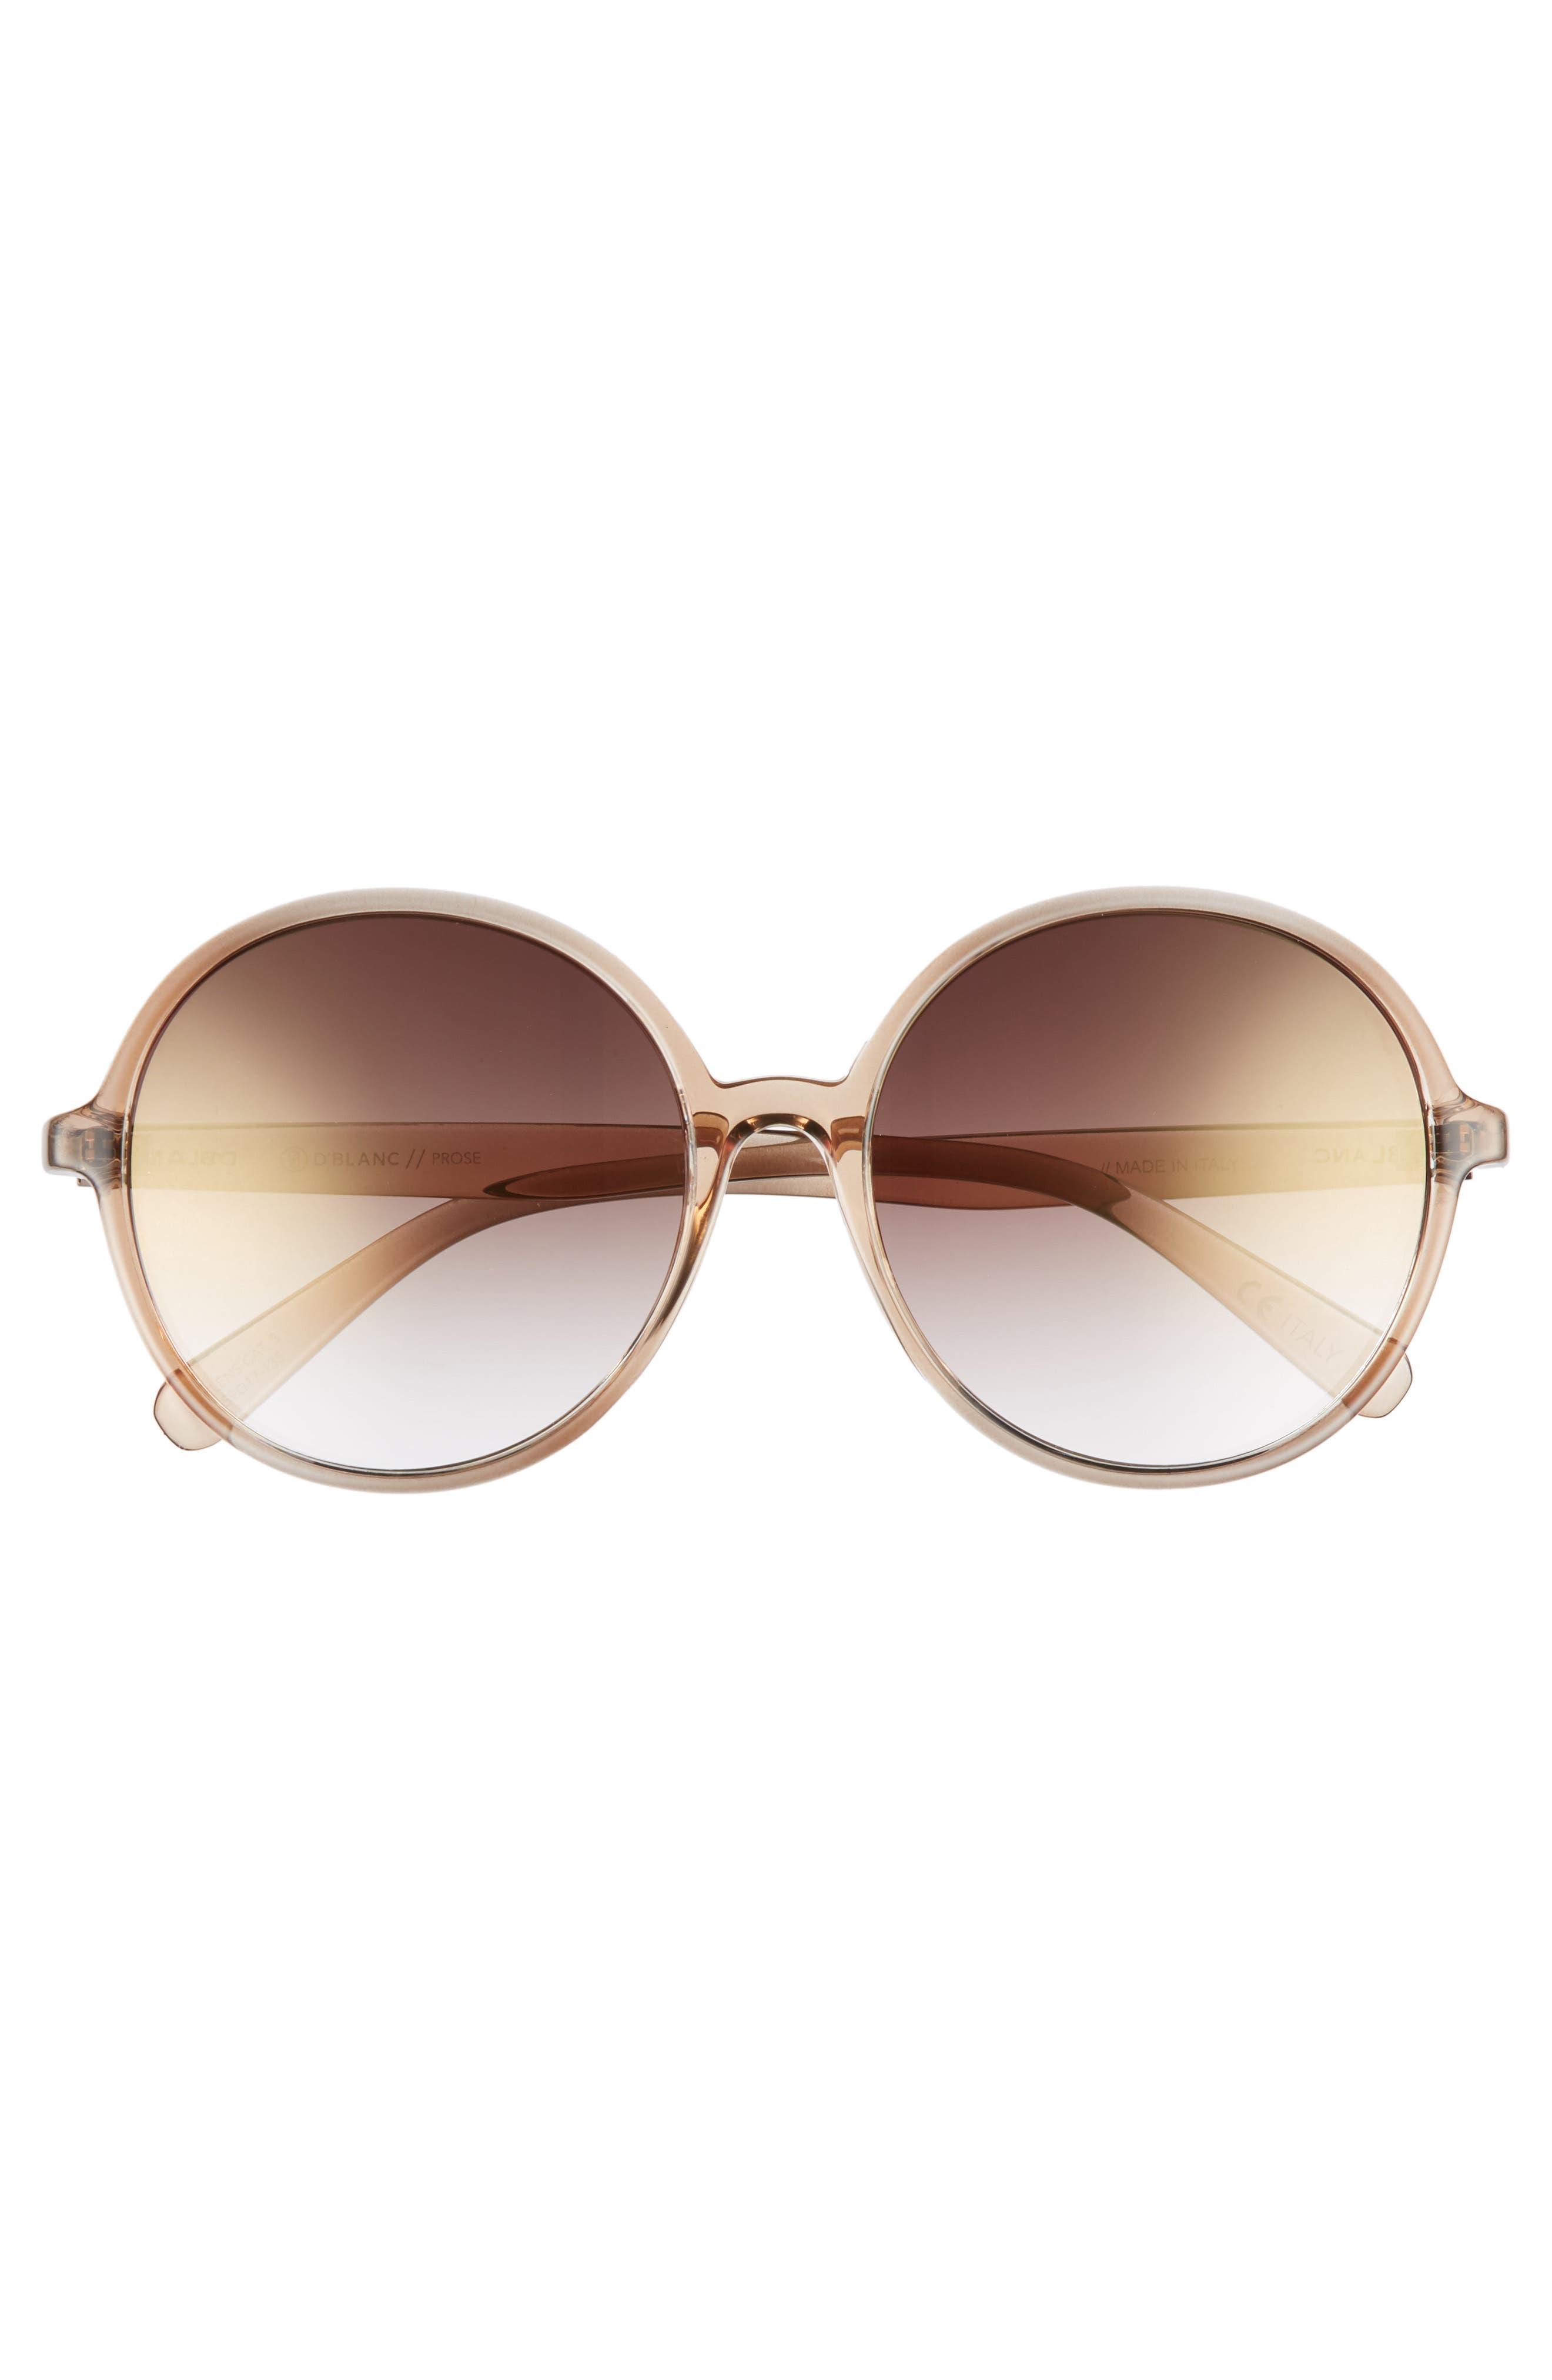 D'BLANC Prose 59mm Round Sunglasses,                             Alternate thumbnail 3, color,                             BROWN OMBRE